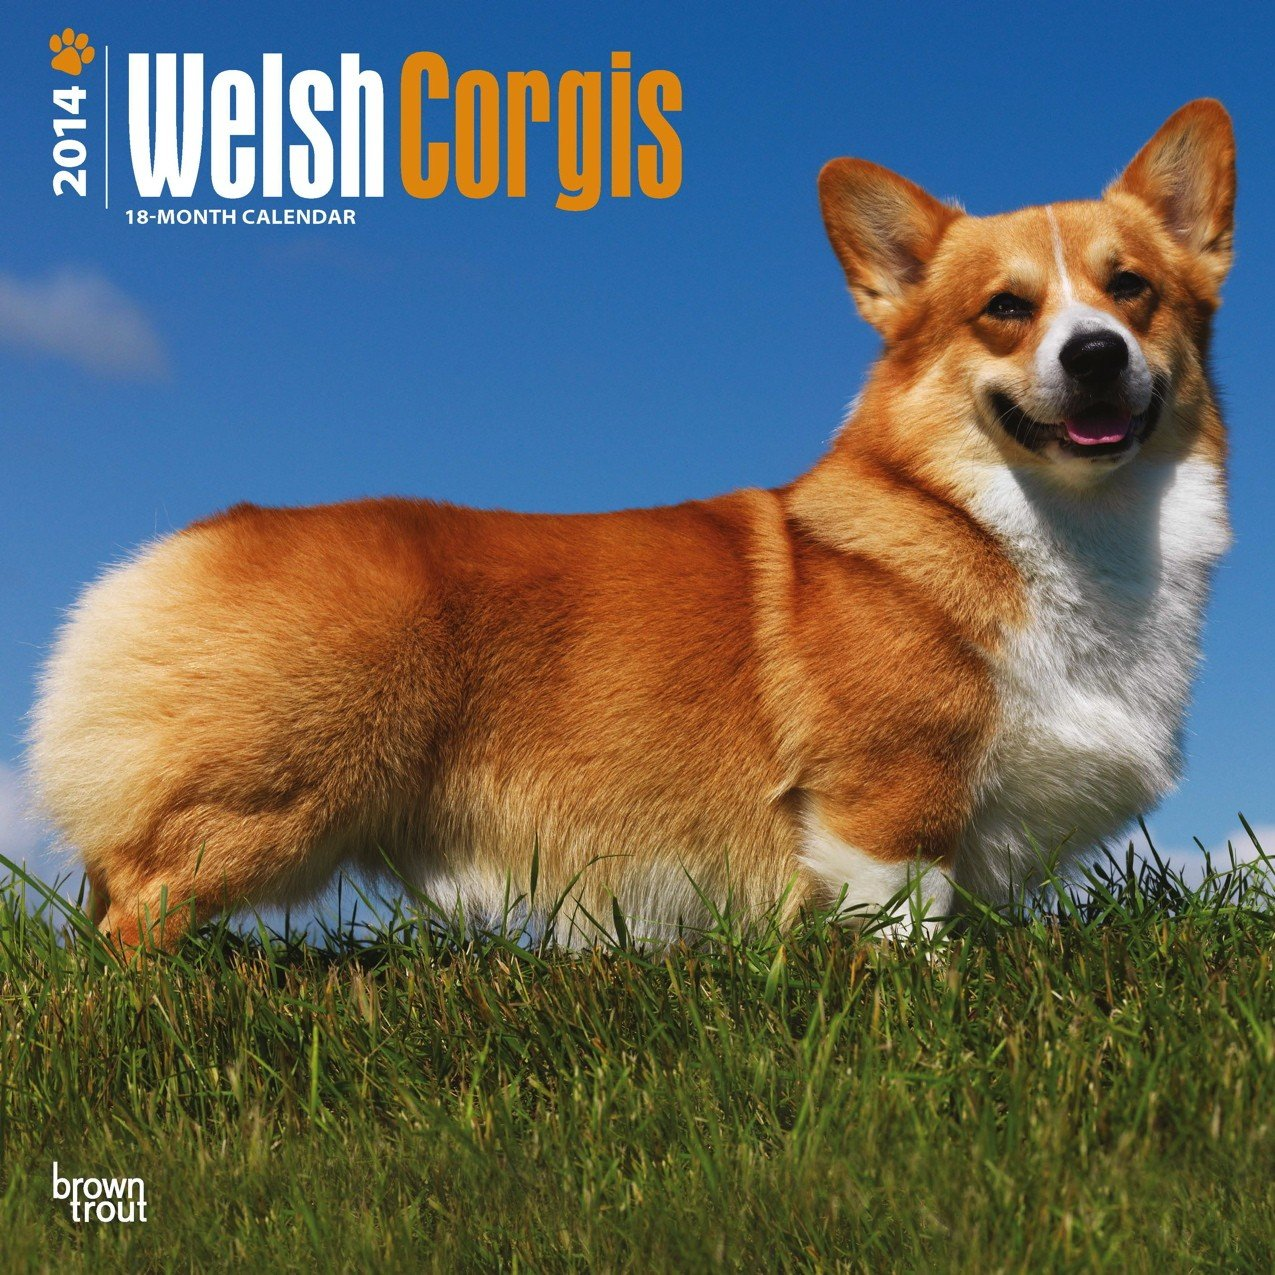 Welsh Corgis 2014 Calendar, 18-Month Calendar (Multilingual Edition) pdf